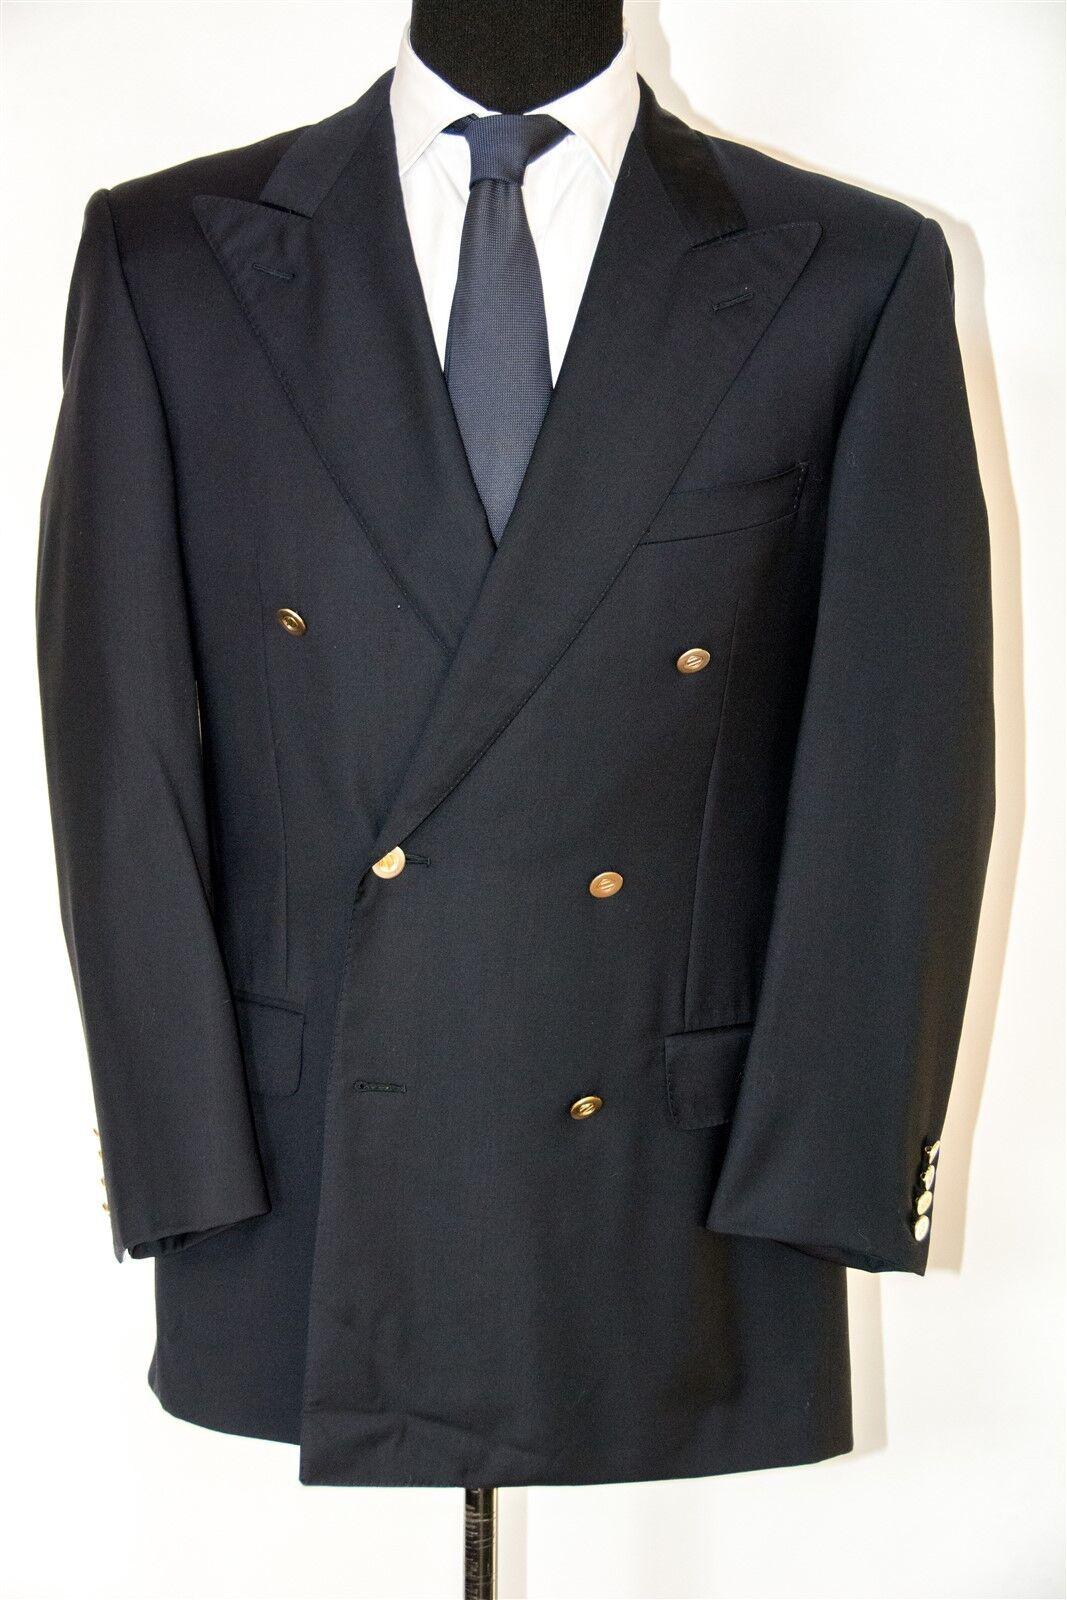 Ermenegildo Zegna Navy Double Breasted Blazer, Größe 42L